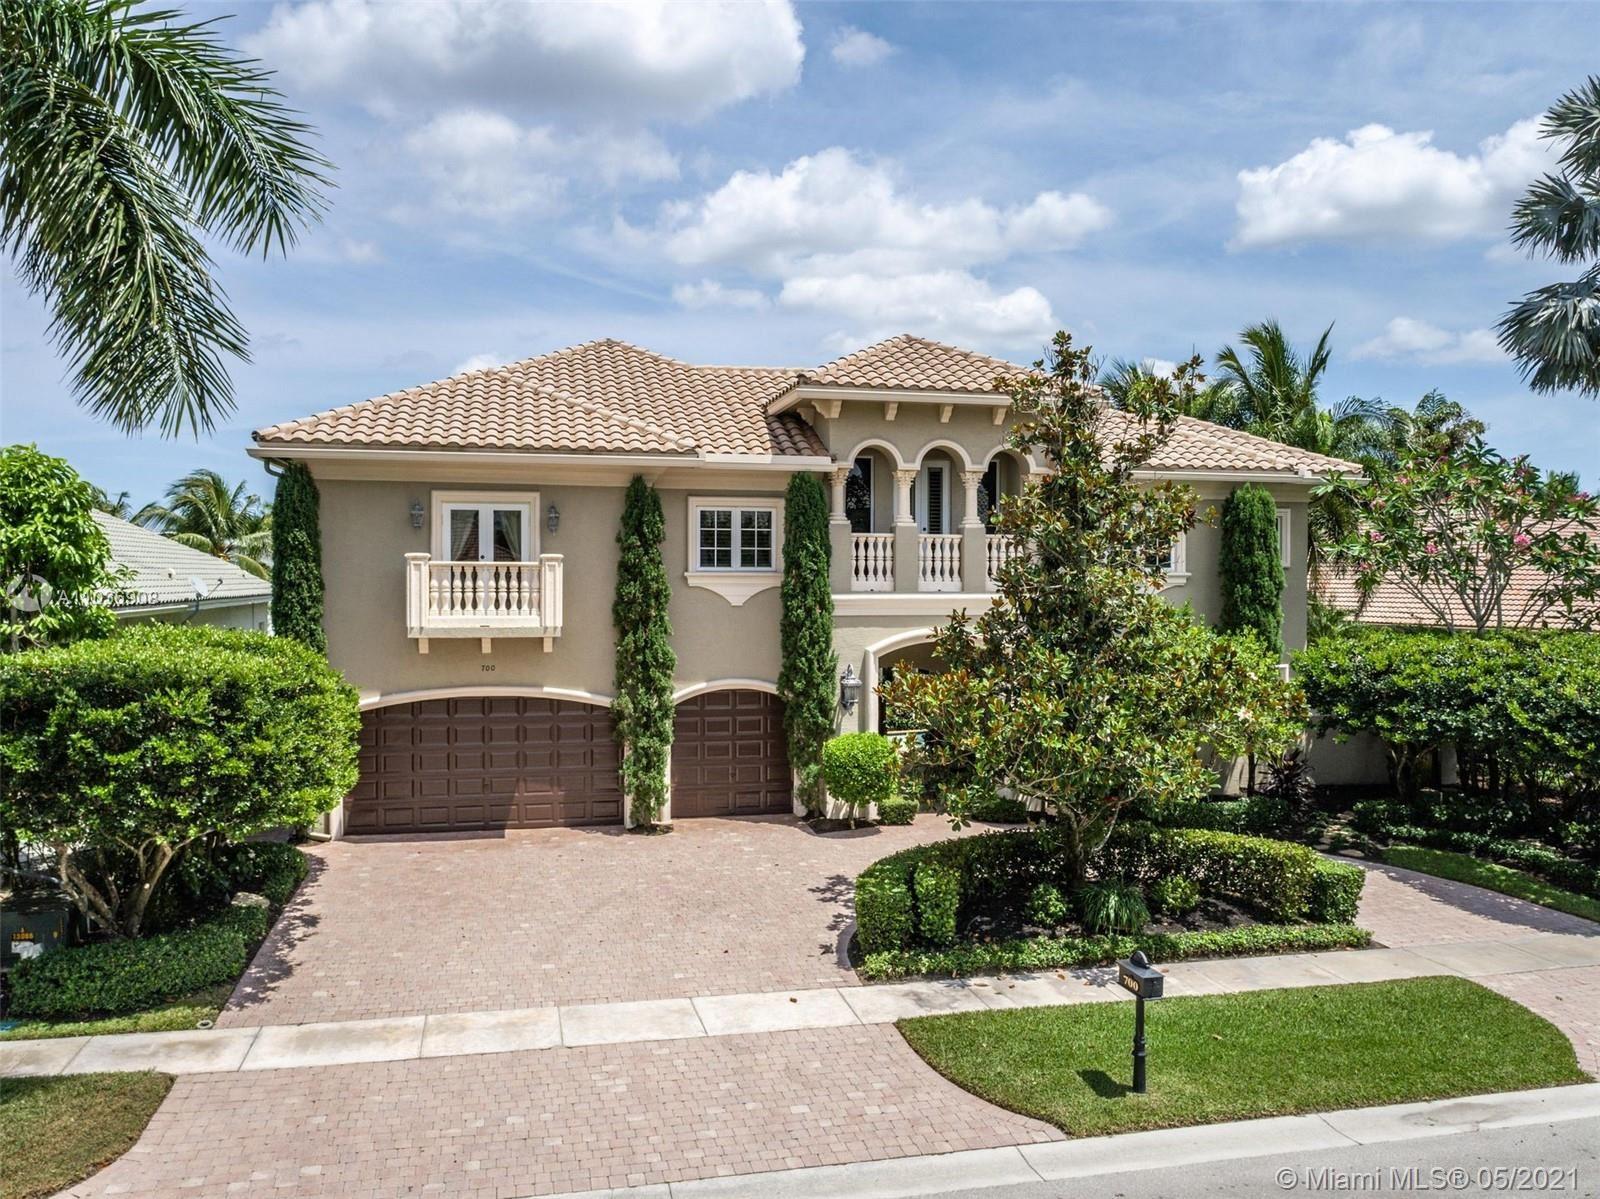 700 Baldwin Palm Ave, Plantation, FL 33324 - #: A11036908